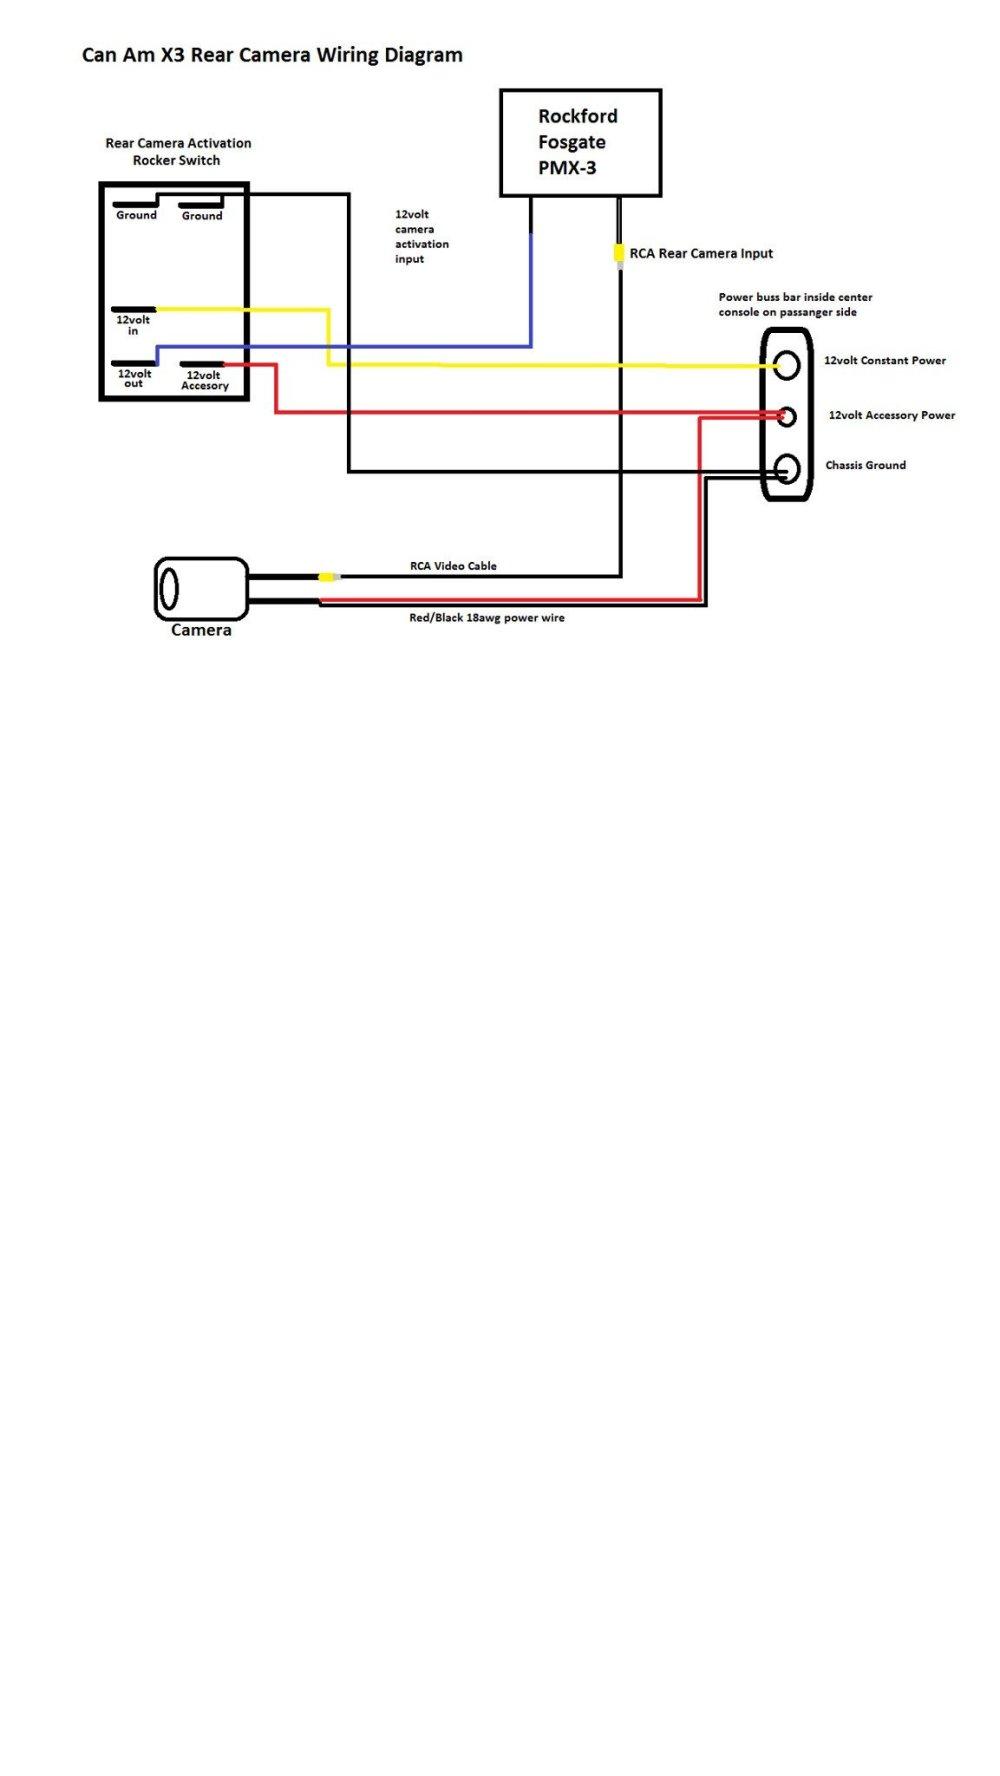 medium resolution of x3 rockford fosagate rear camera kit 2005 bmw x3 radio wiring diagram 04 bmw x3 radio wiring diagram